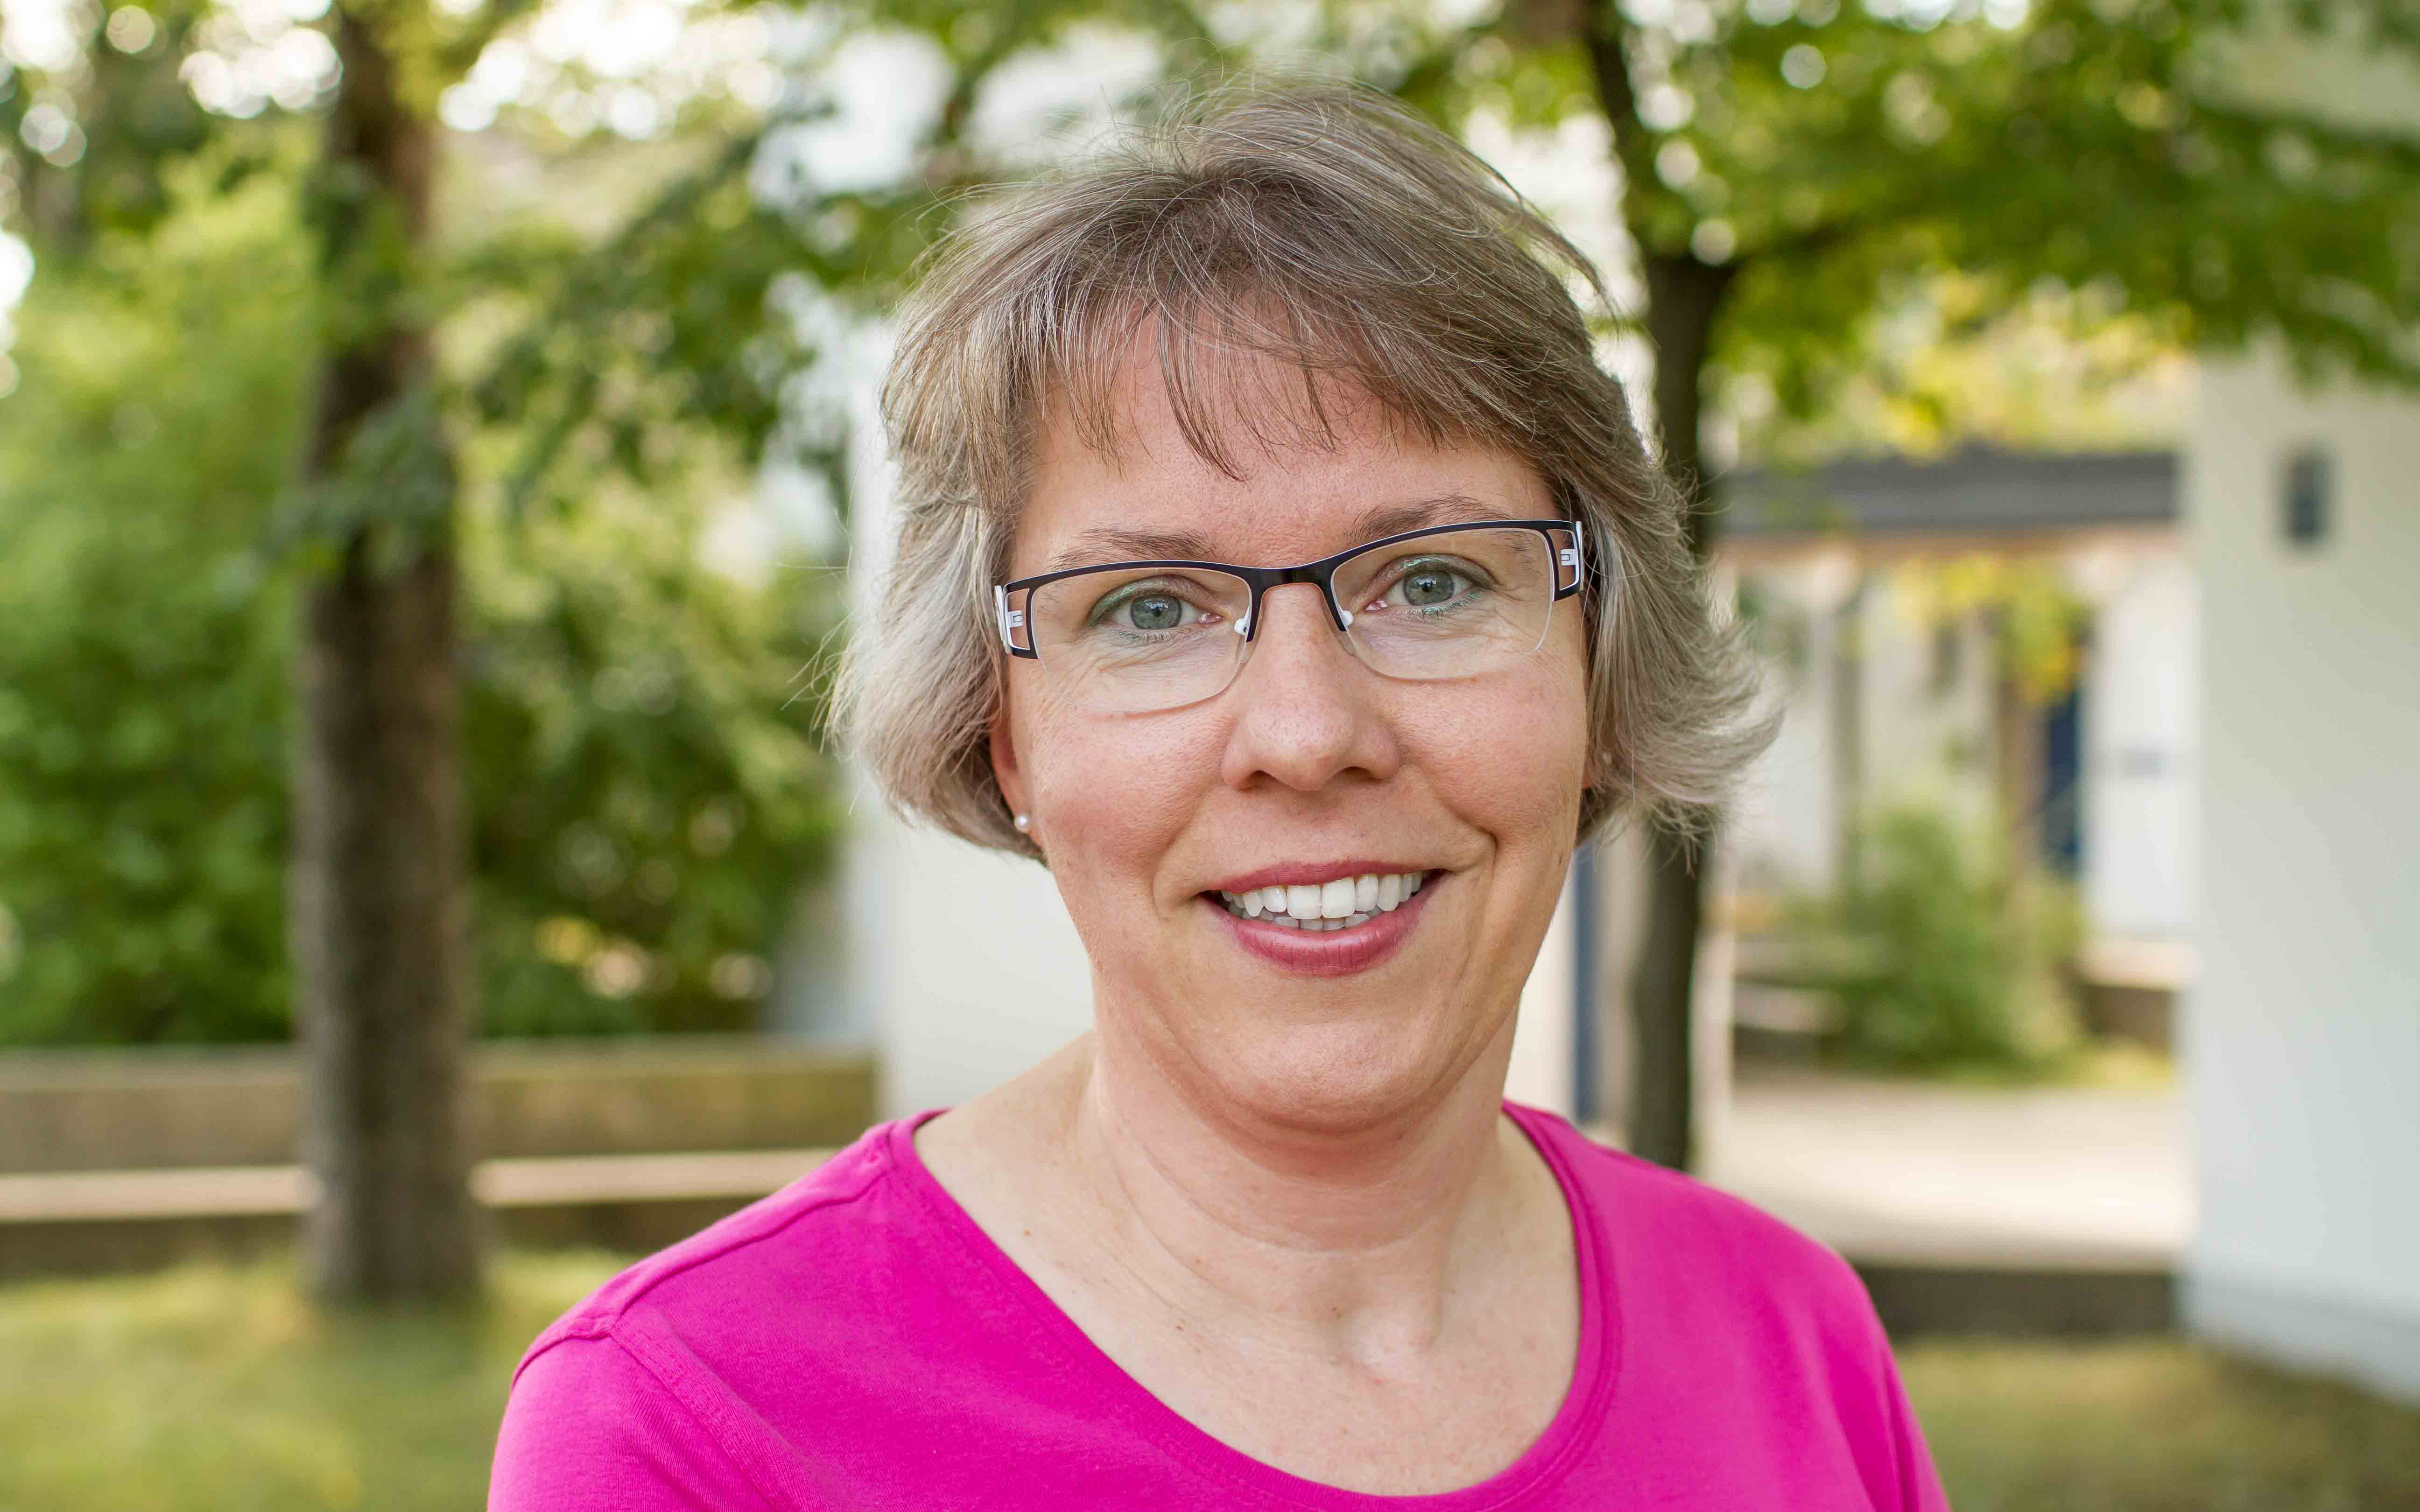 Simone Veit